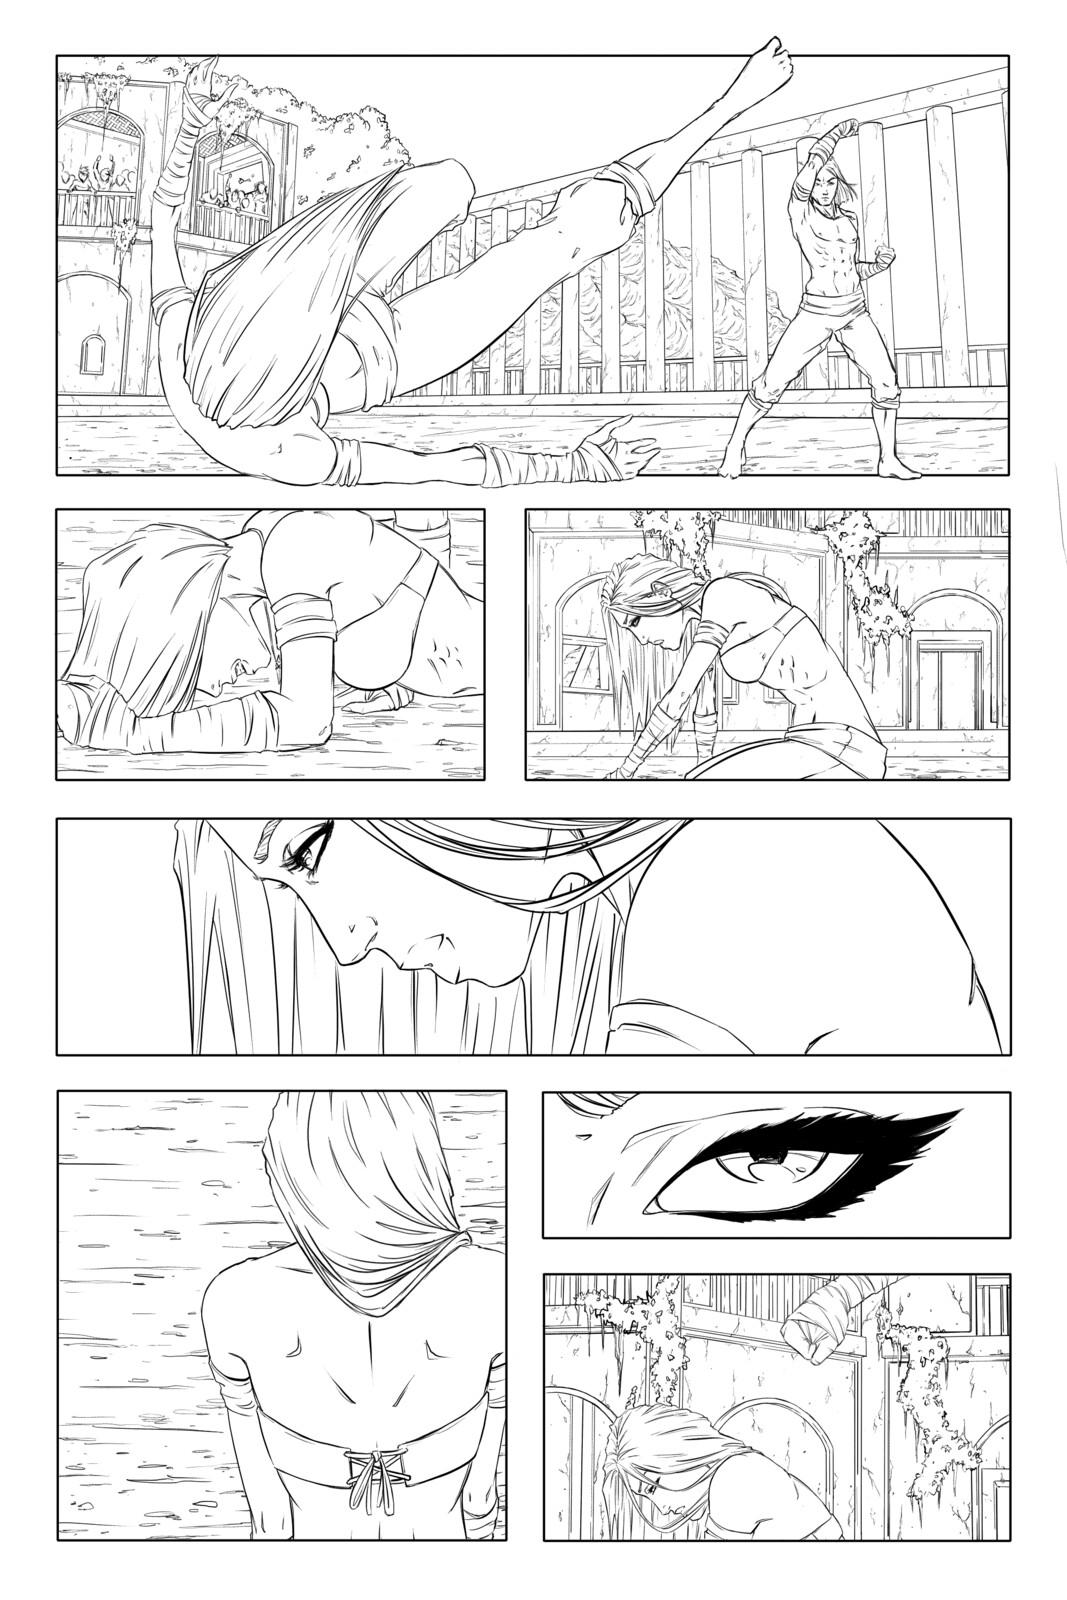 Page 6 - Line art